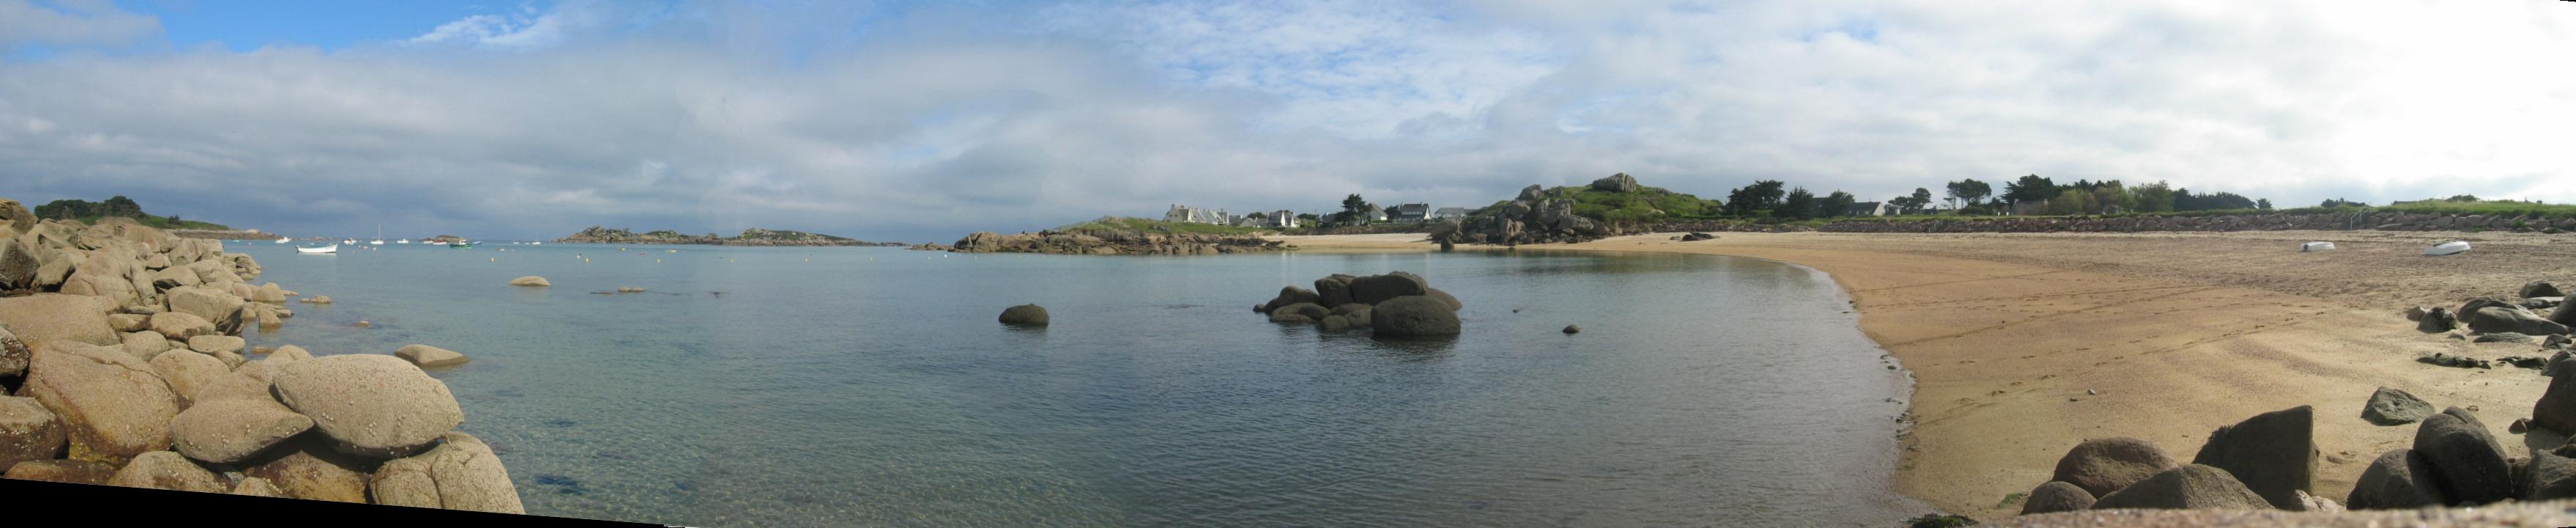 L'image « http://upload.wikimedia.org/wikipedia/commons/4/43/Tregastel_Brittany_France.jpg » ne peut être affichée, car elle contient des erreurs.